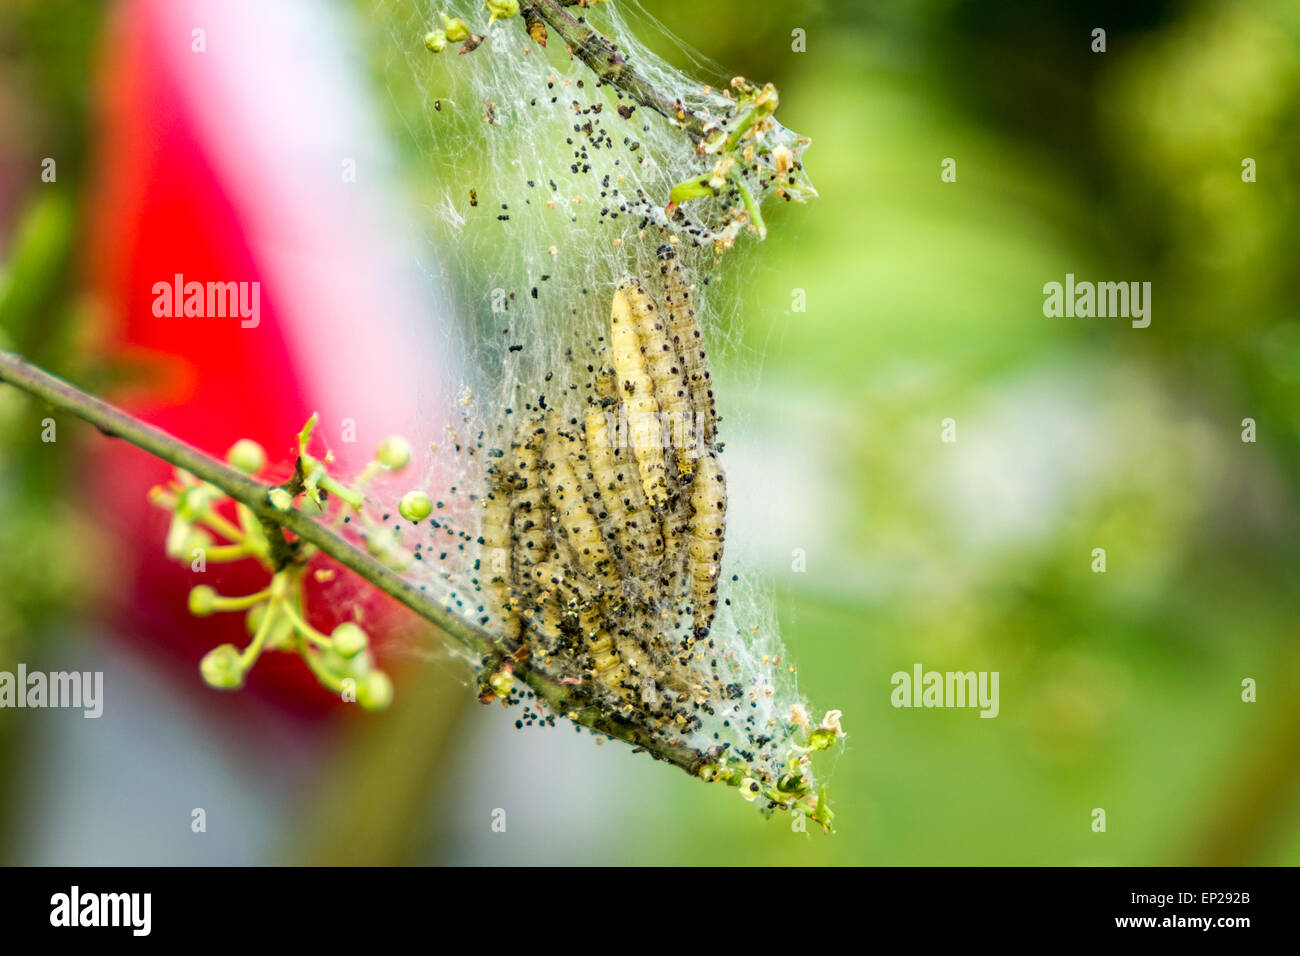 colony-of-ermine-moth-caterpillars-eatin